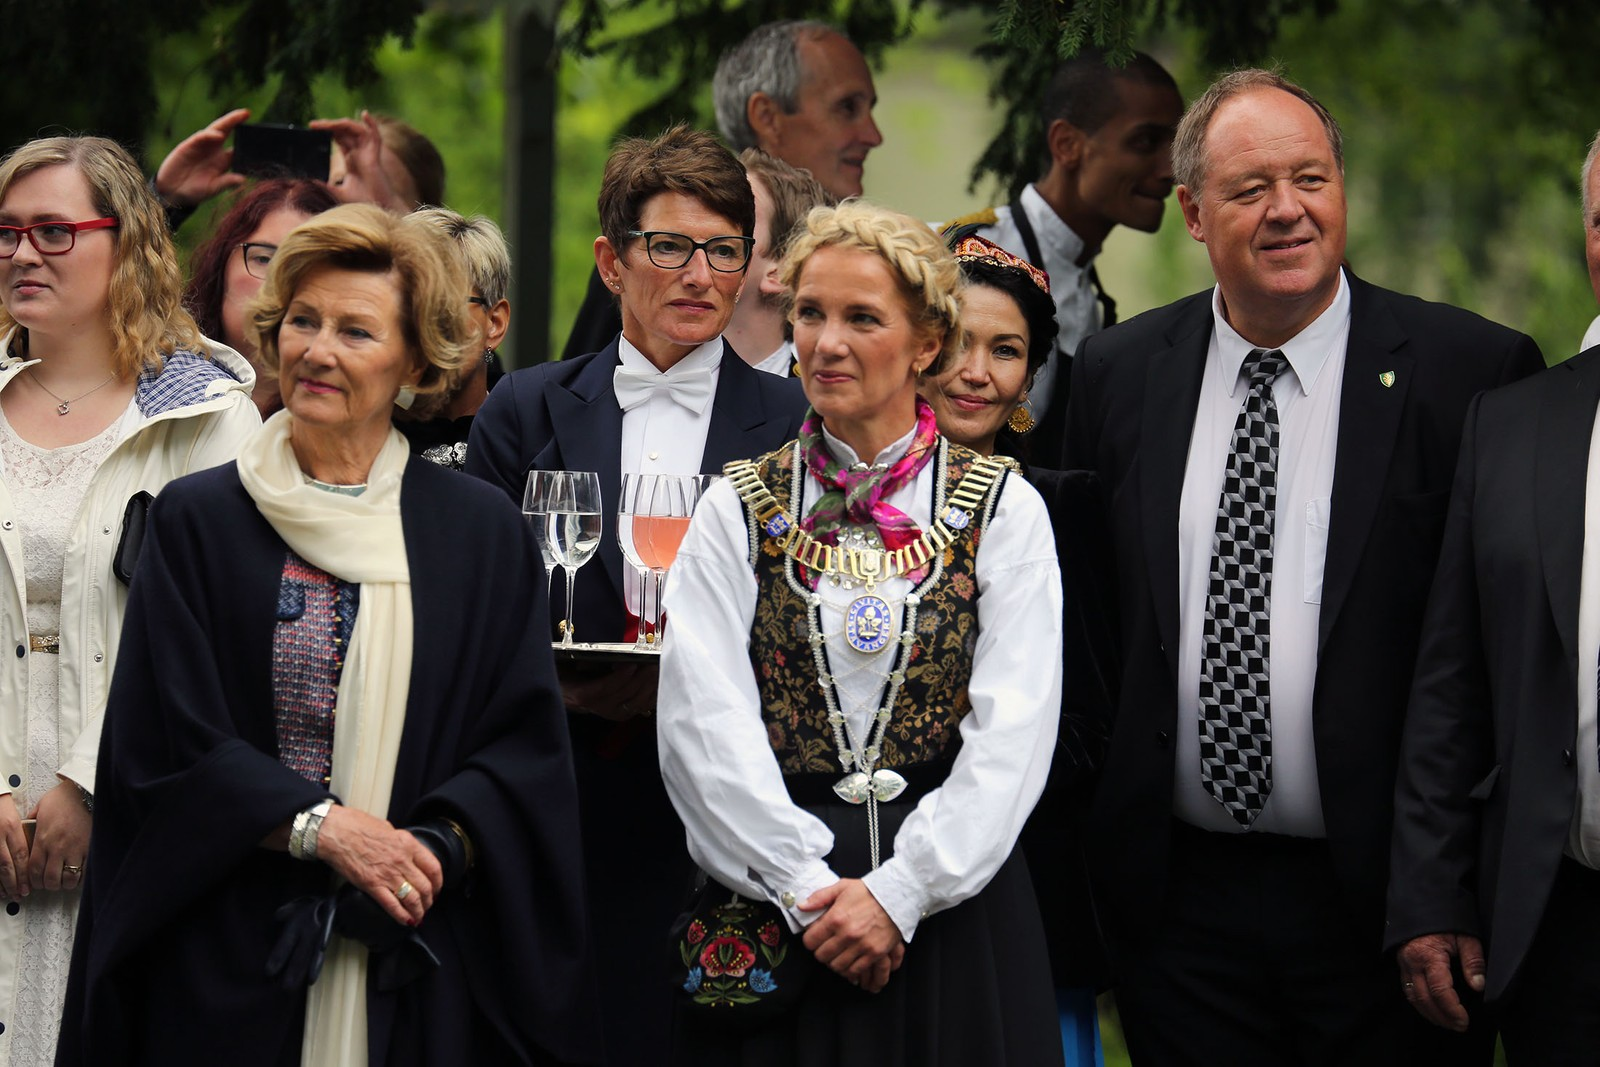 Fra hagefesten utenfor kongeboligen Ledaal i Stavanger – Dronning Sonja, Stavanger-ordfører Christine Sagen Helgø og Leif Erik Egaas.